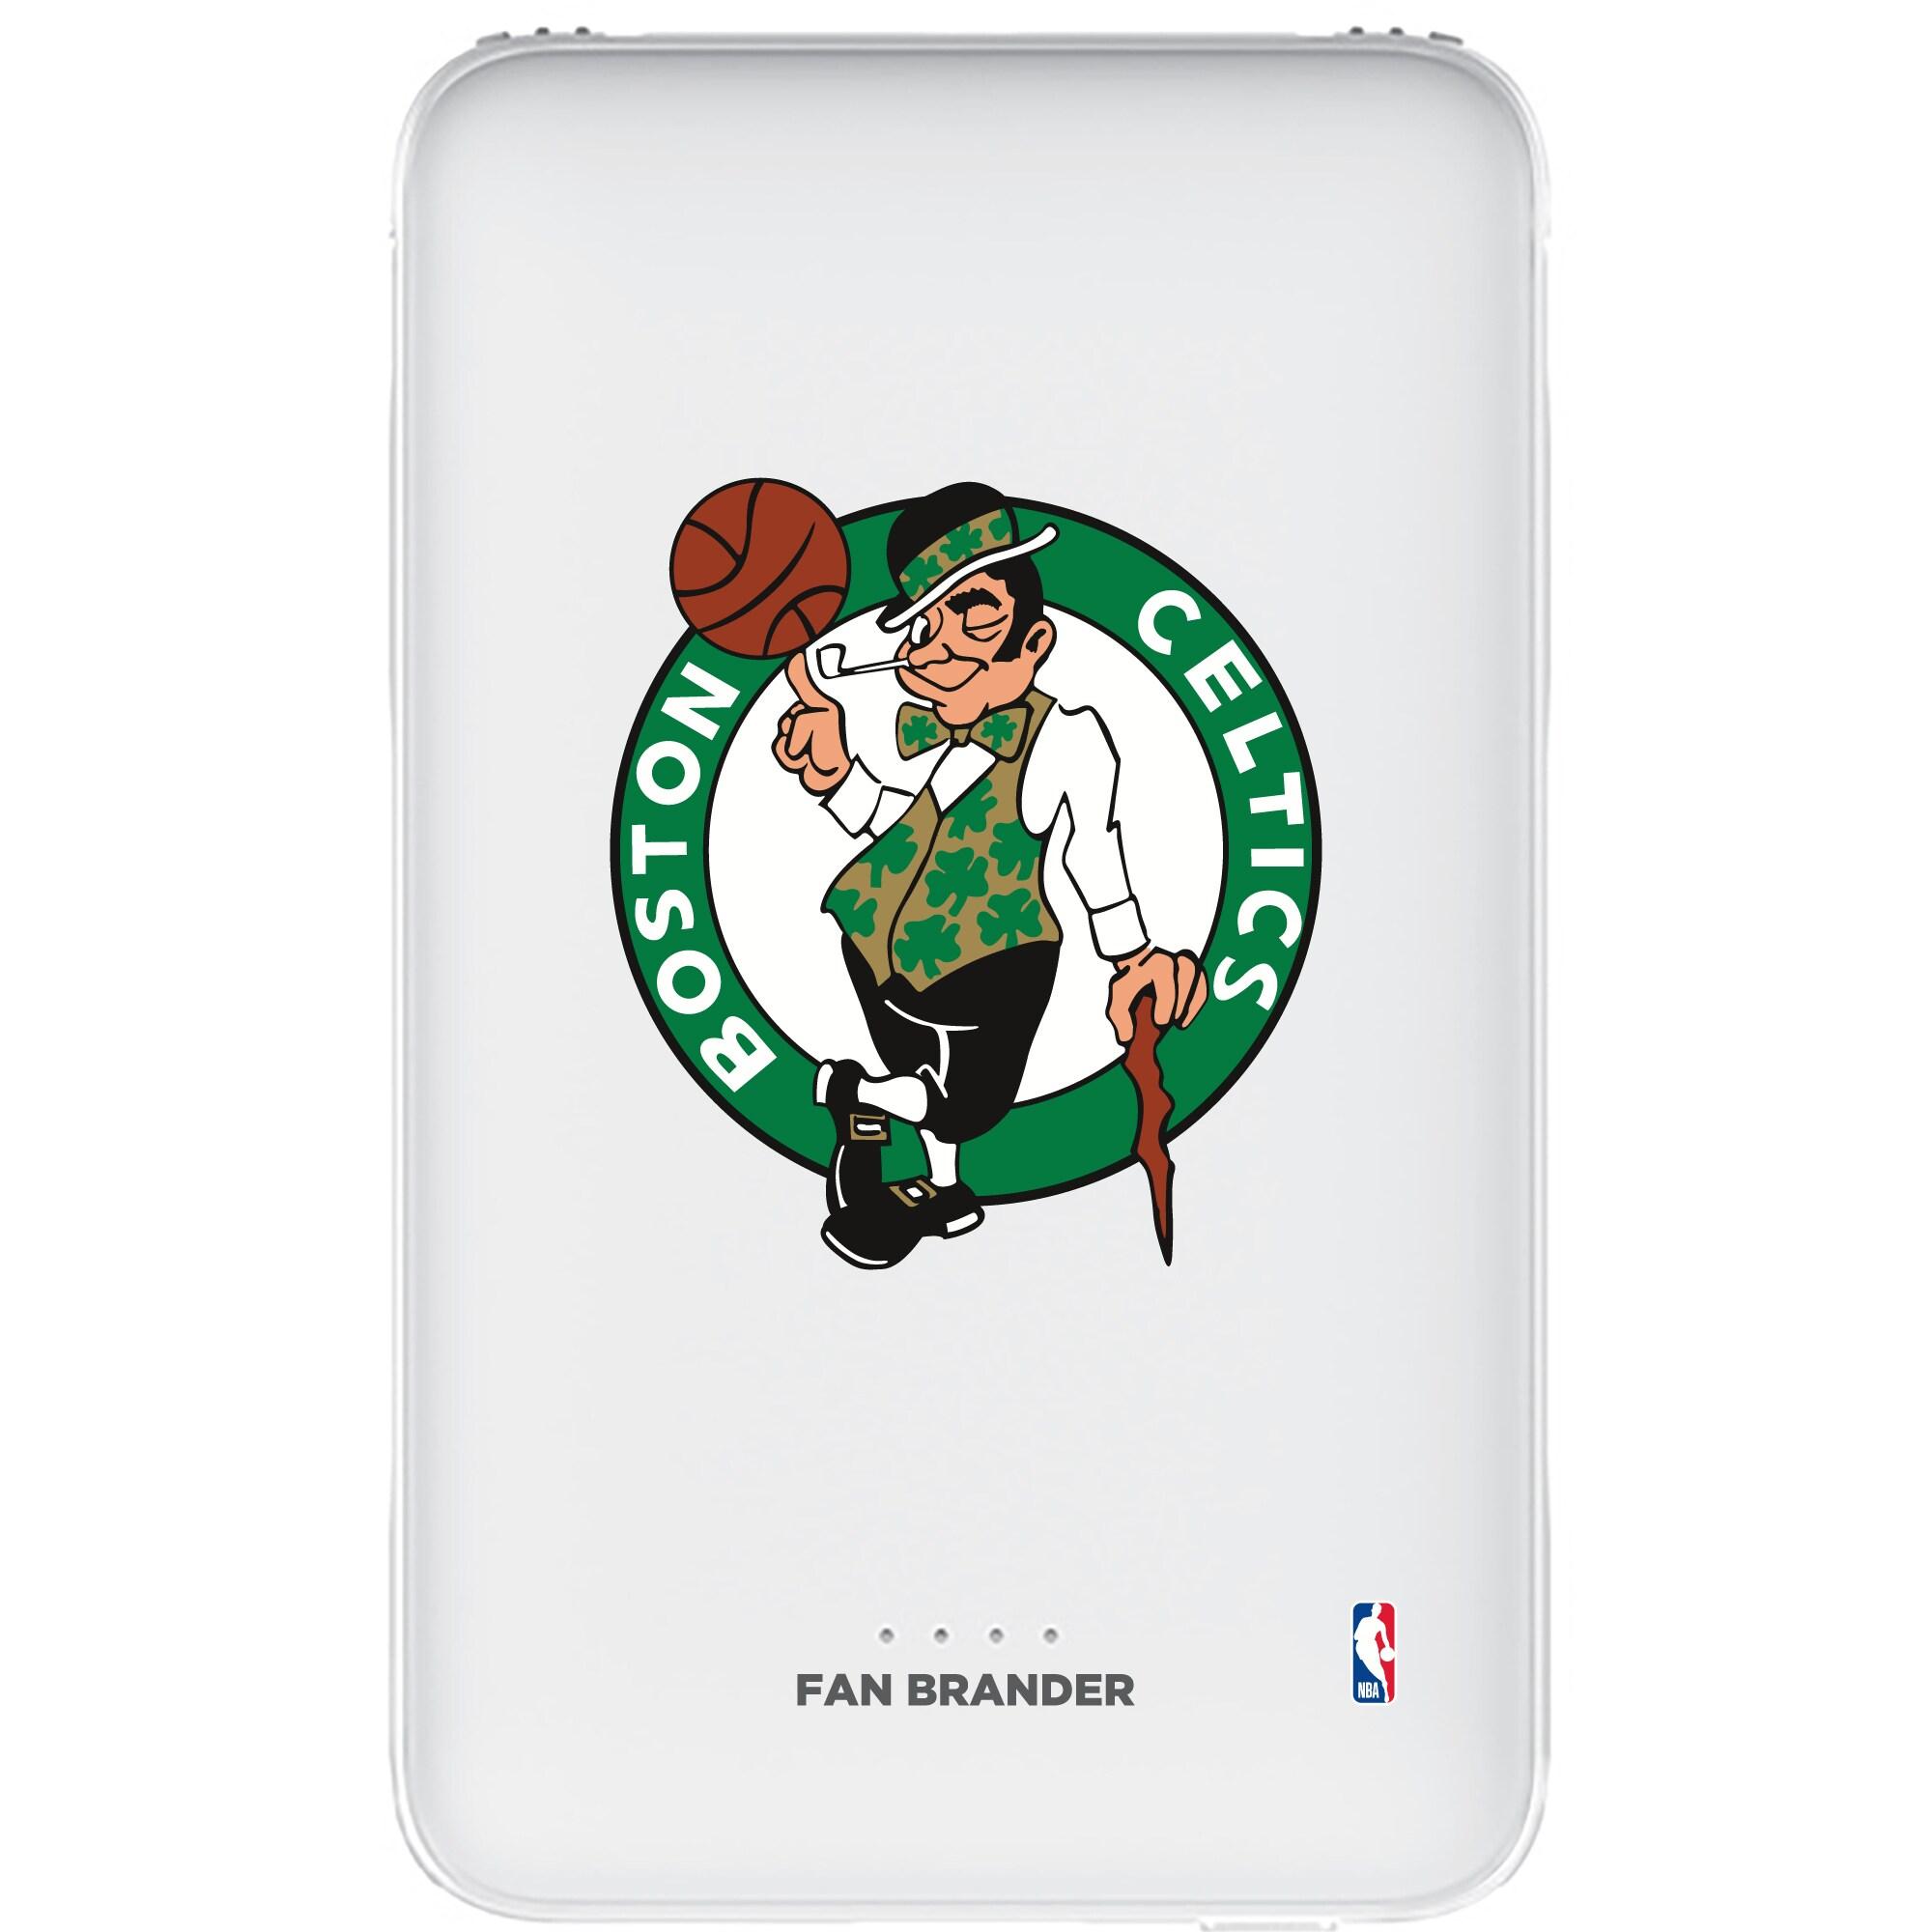 Boston Celtics 5000mAh Portable Power Bank - White